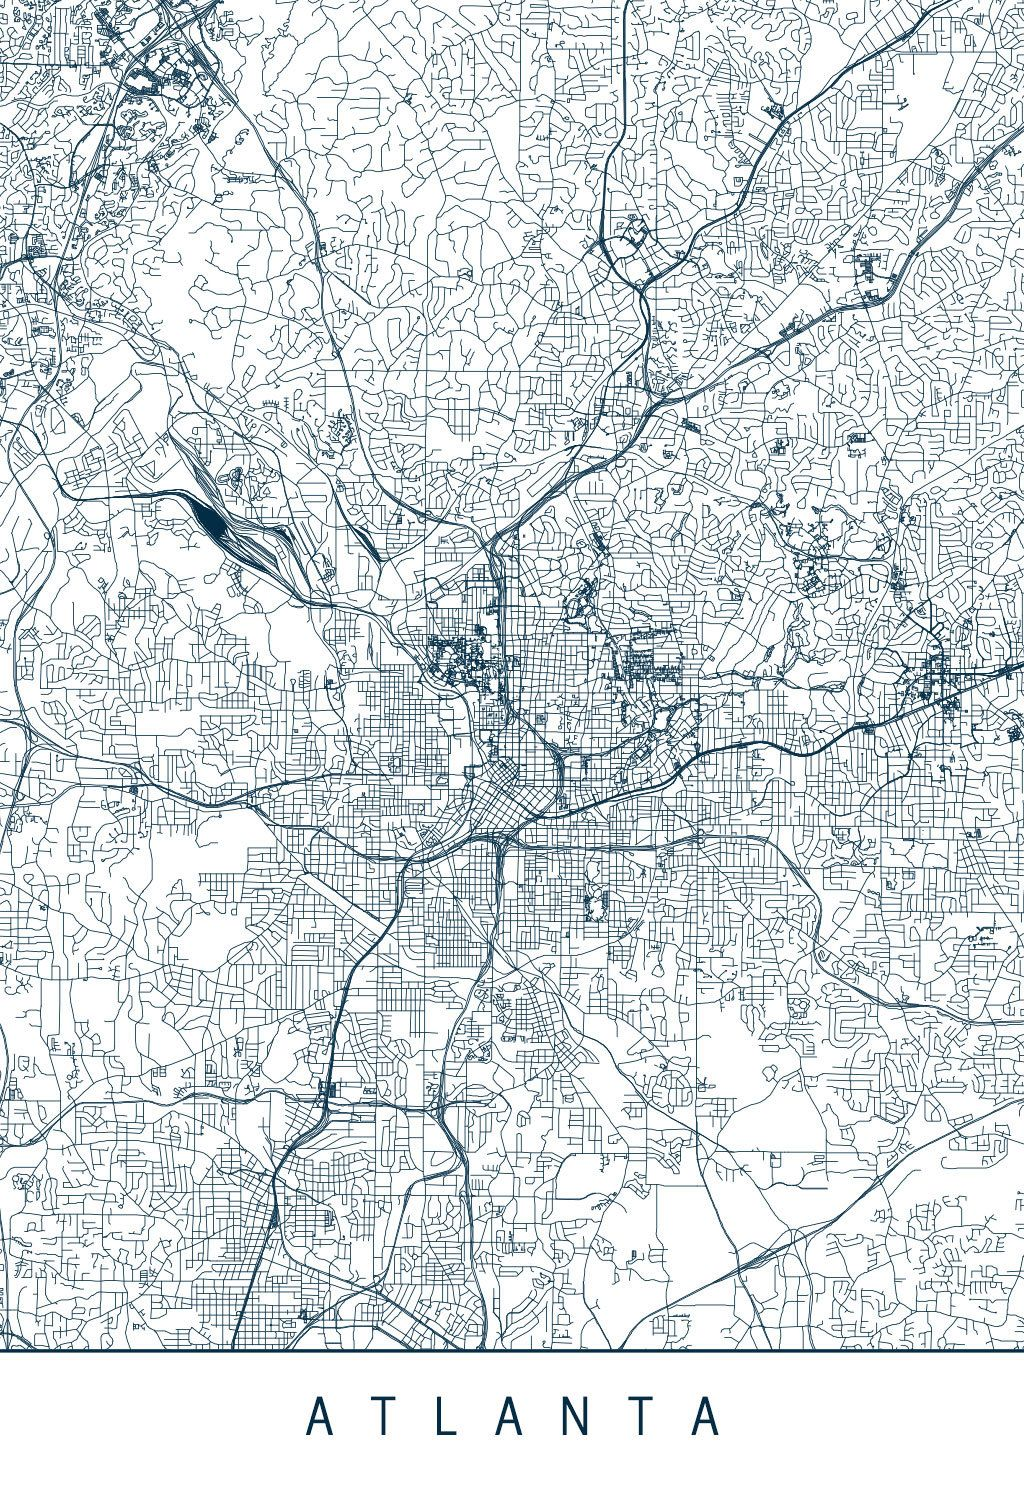 Karte / Map ~ Atlanta, Georgia - Vereinigte Staaten von Amerika ...